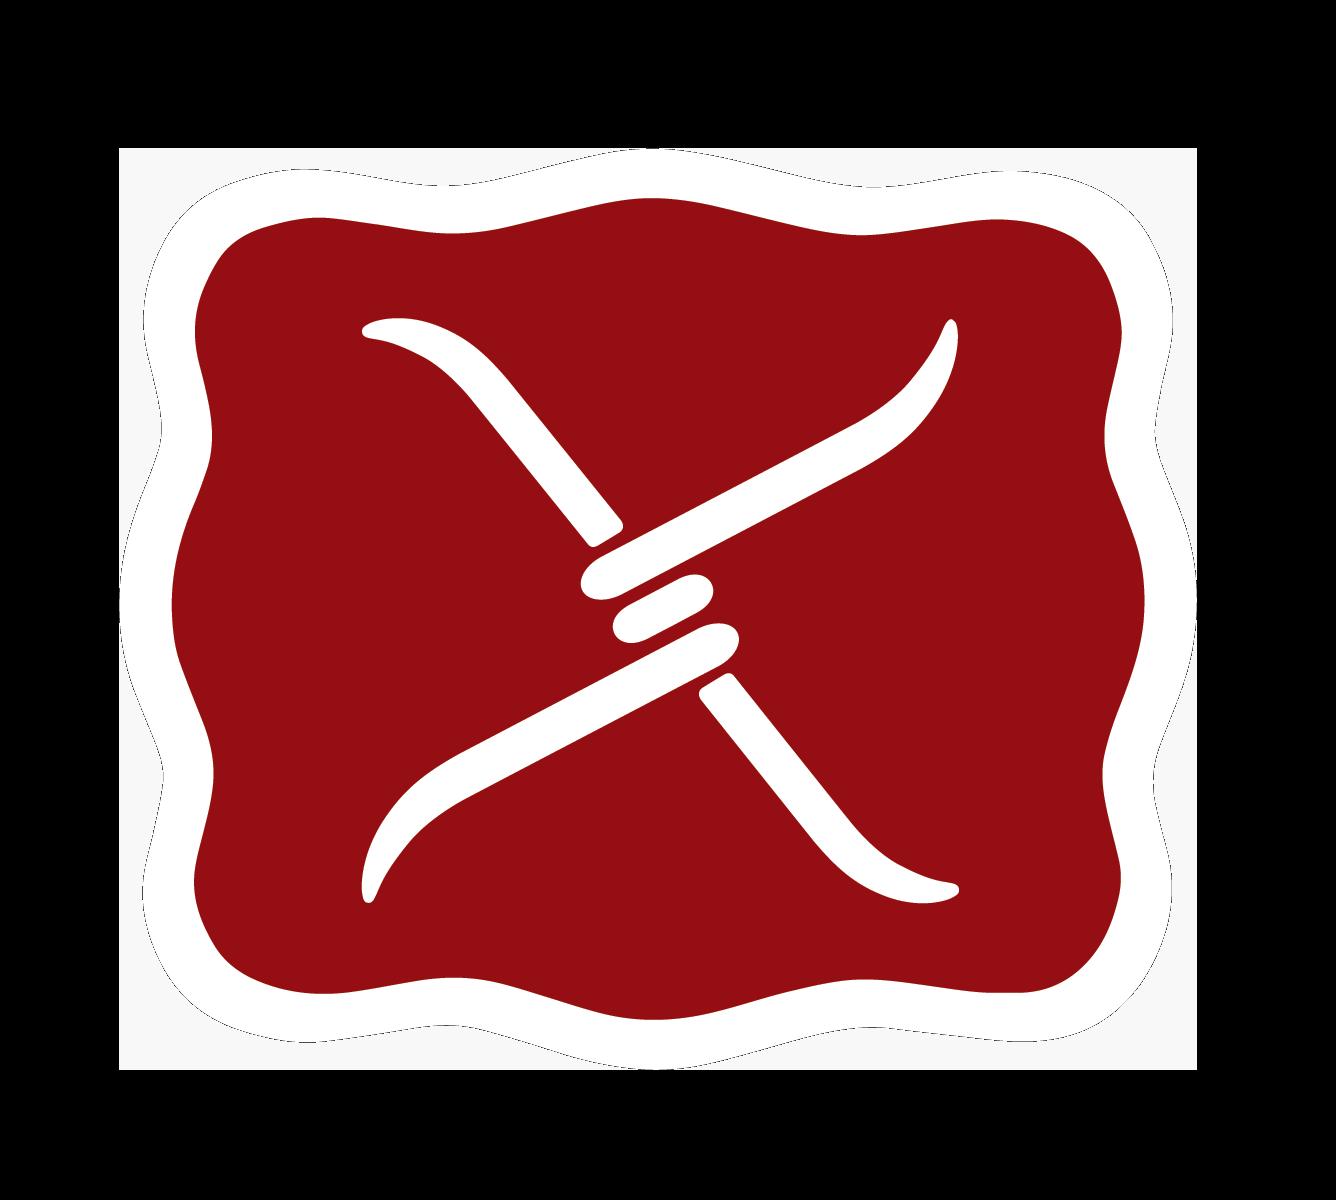 _TWX-Banner-Logo-MASTER_Artboard 1